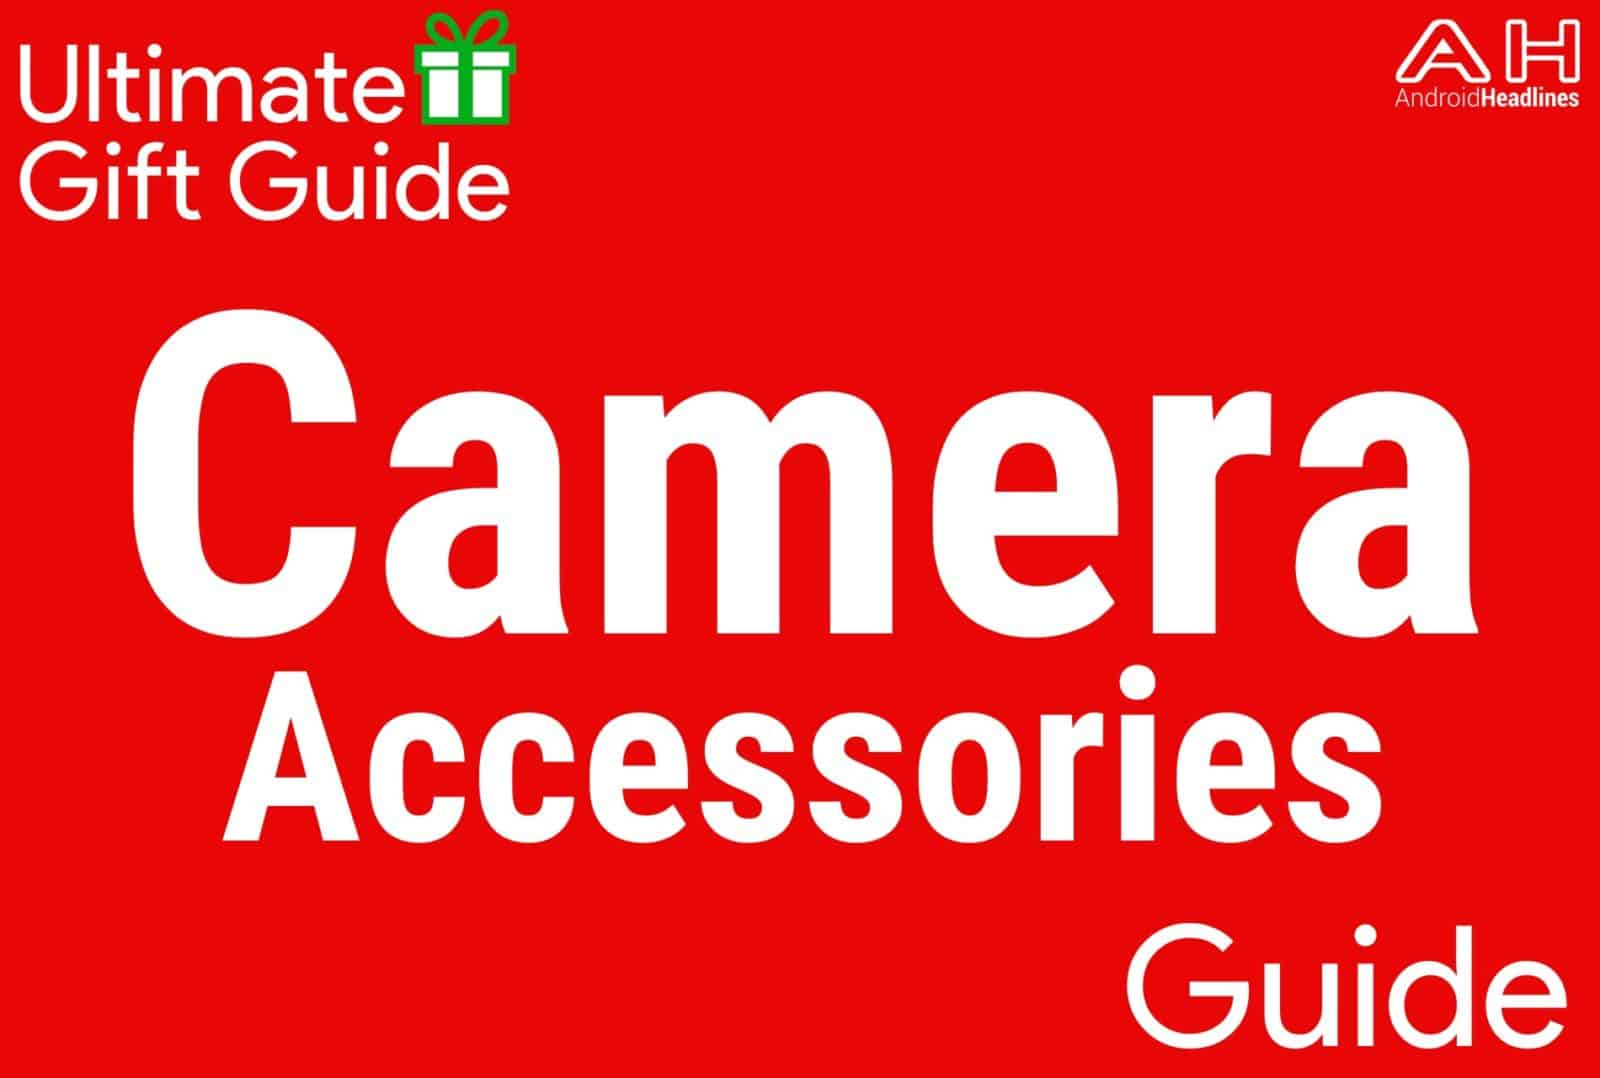 Camera Accessories - Gift Guide 2015